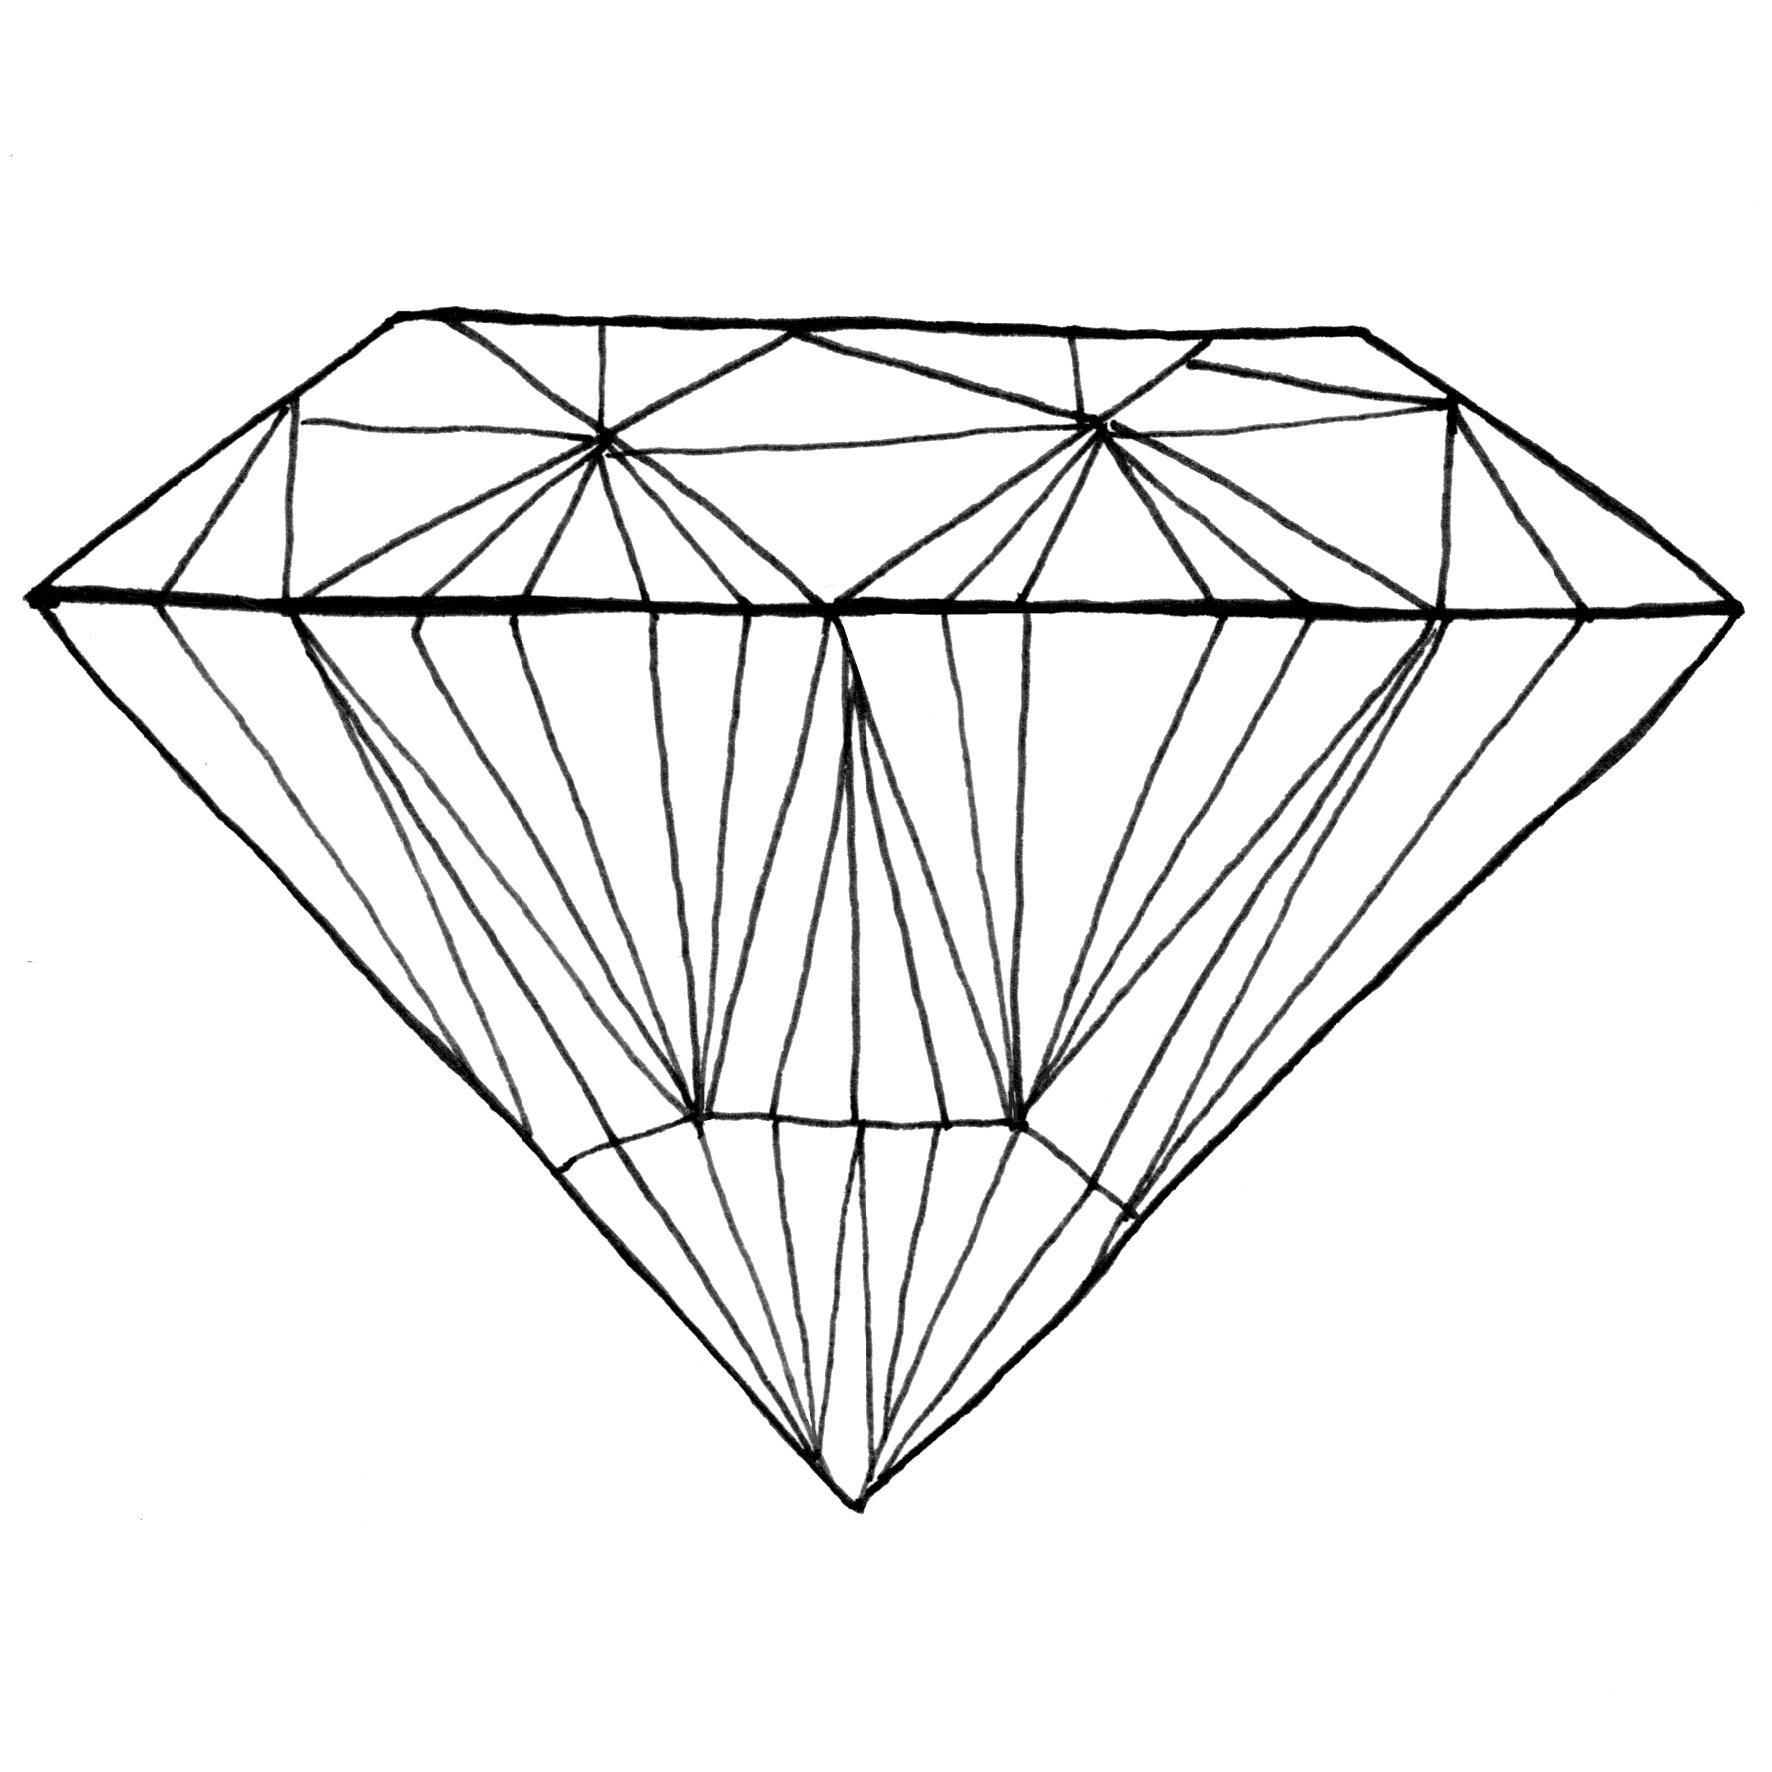 1772x1772 Diamond Line Drawing Easy Diamond Pencil Drawings